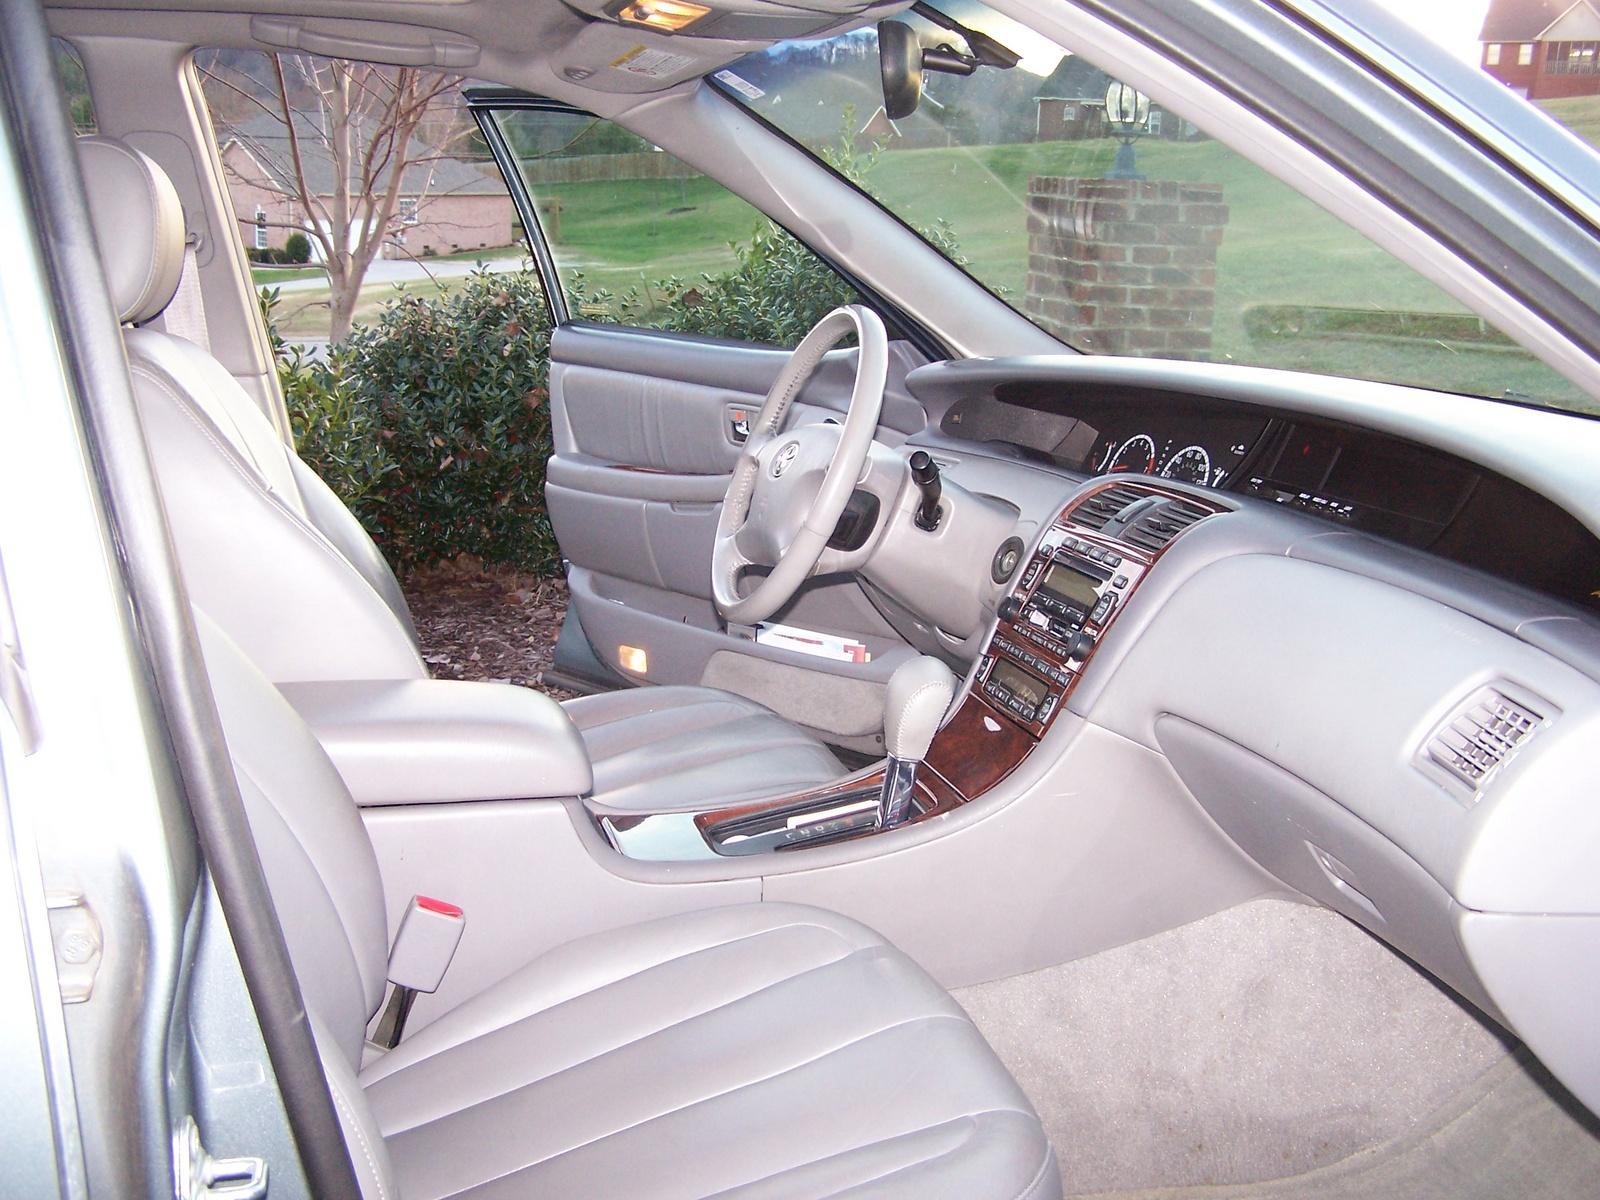 800 1024 1280 1600 Origin 2002 Toyota Avalon ...